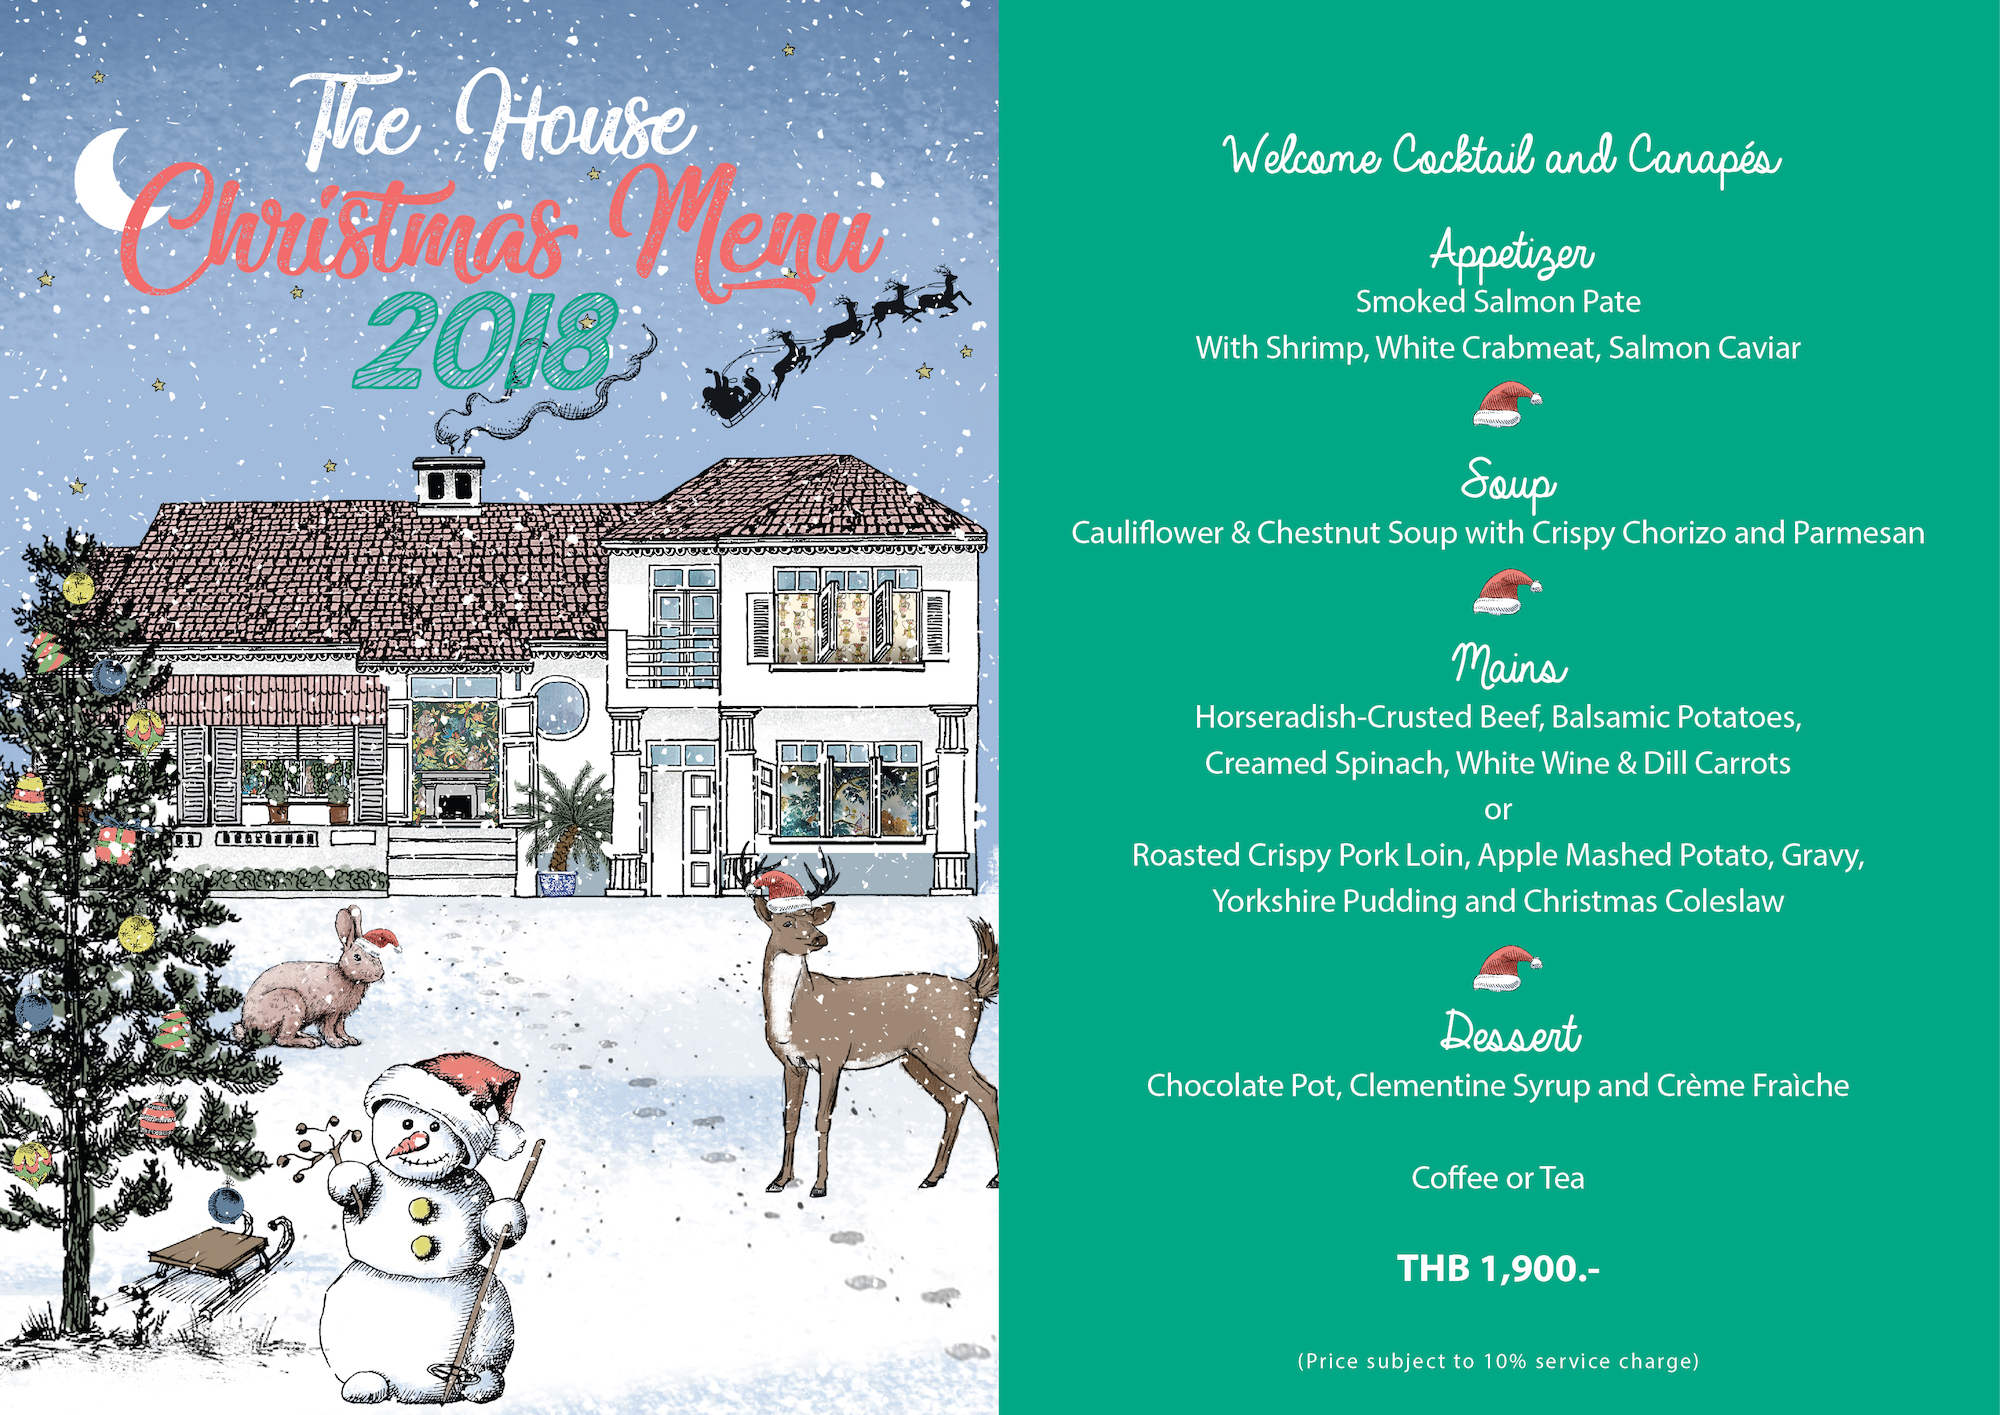 THE HOUSE Christmas Menu 2018-02.jpg